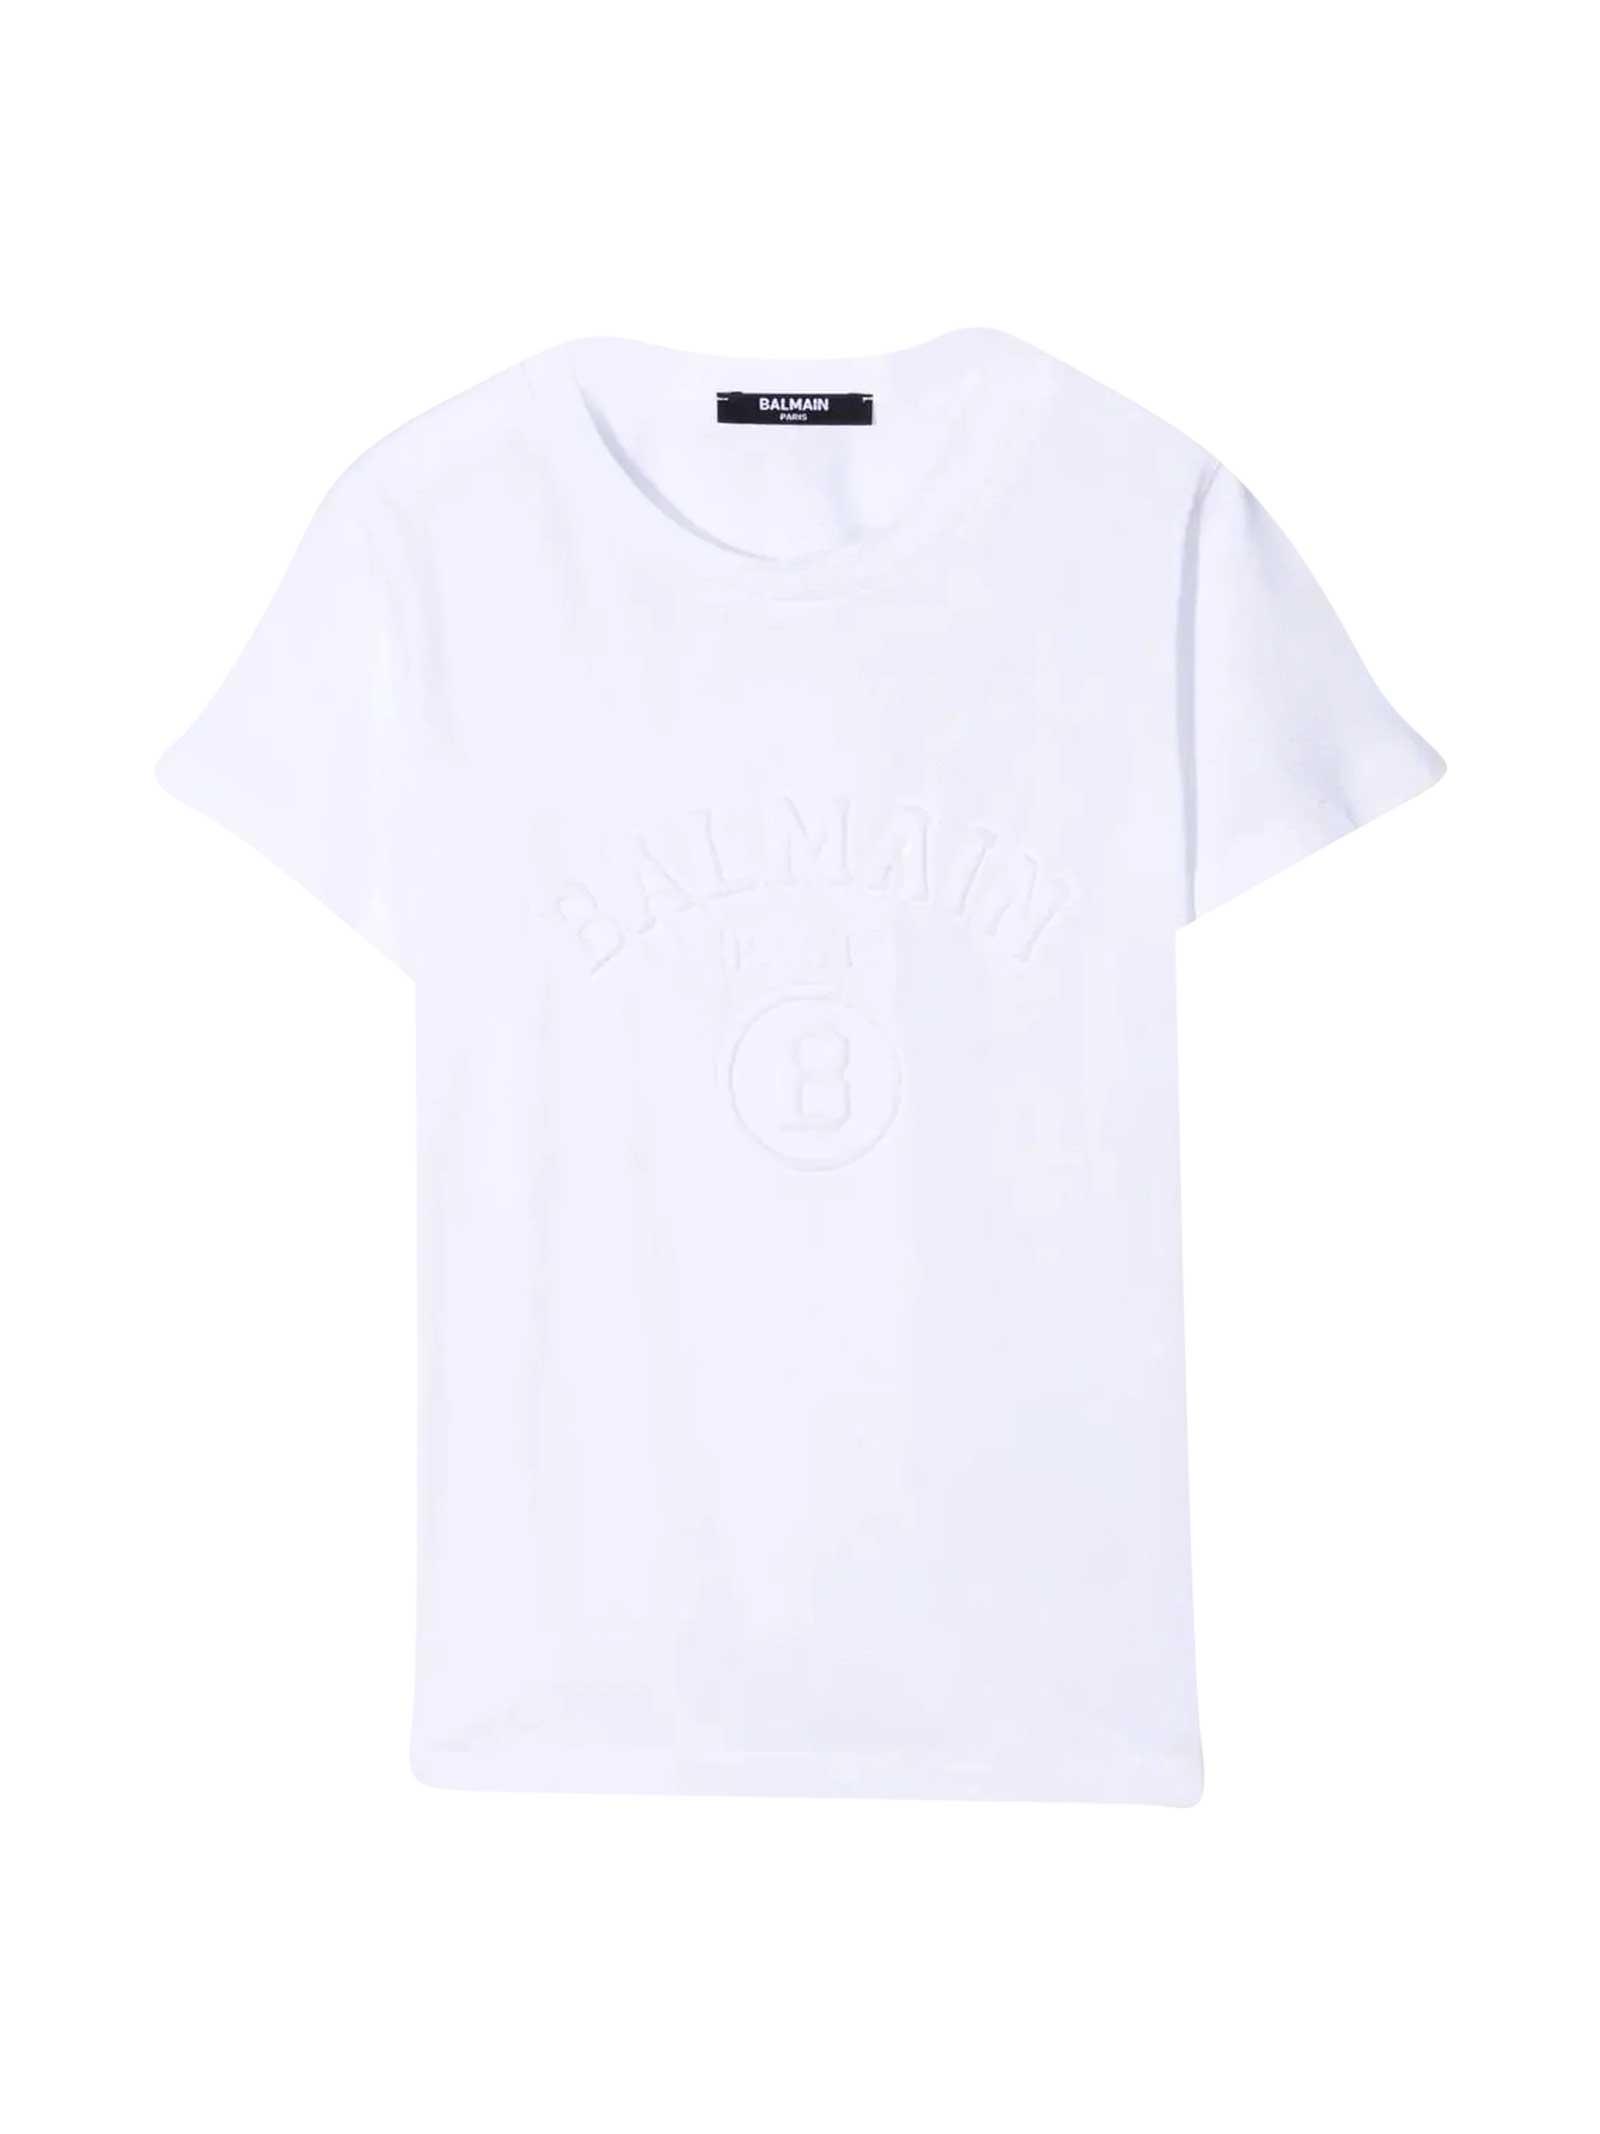 Balmain Clothing WHITE TEEN T-SHIRT